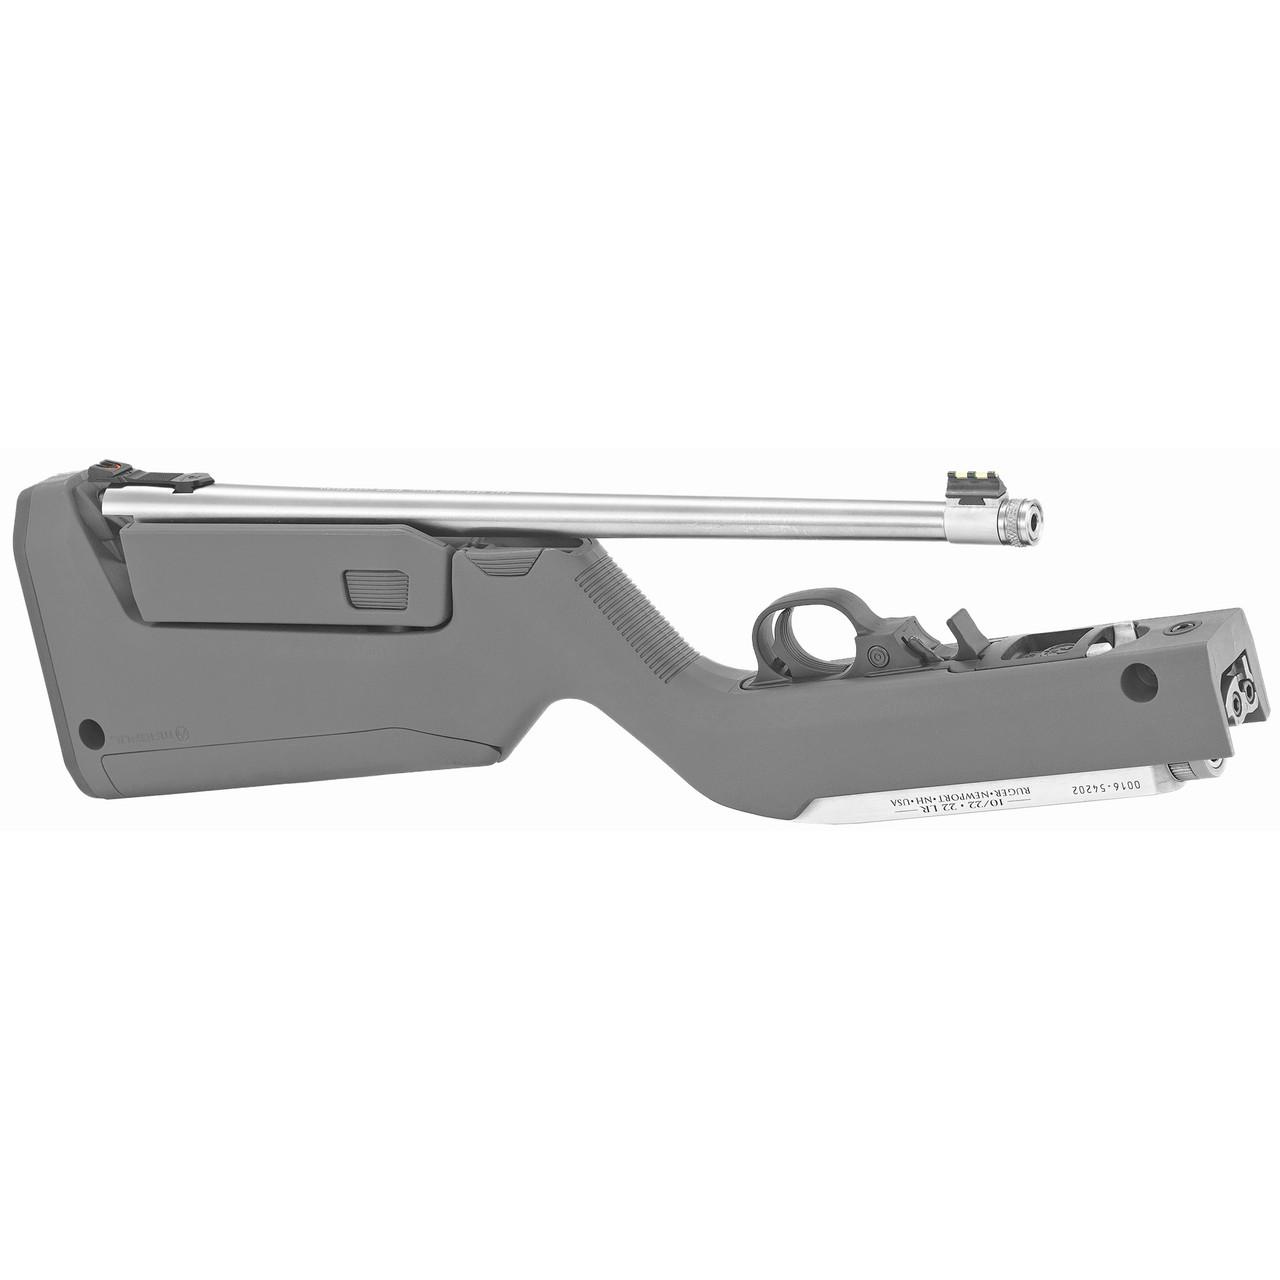 Ruger 10/22 Takedown Backpacker CALIFORNIA LEGAL - .22 LR - Stealth Gray